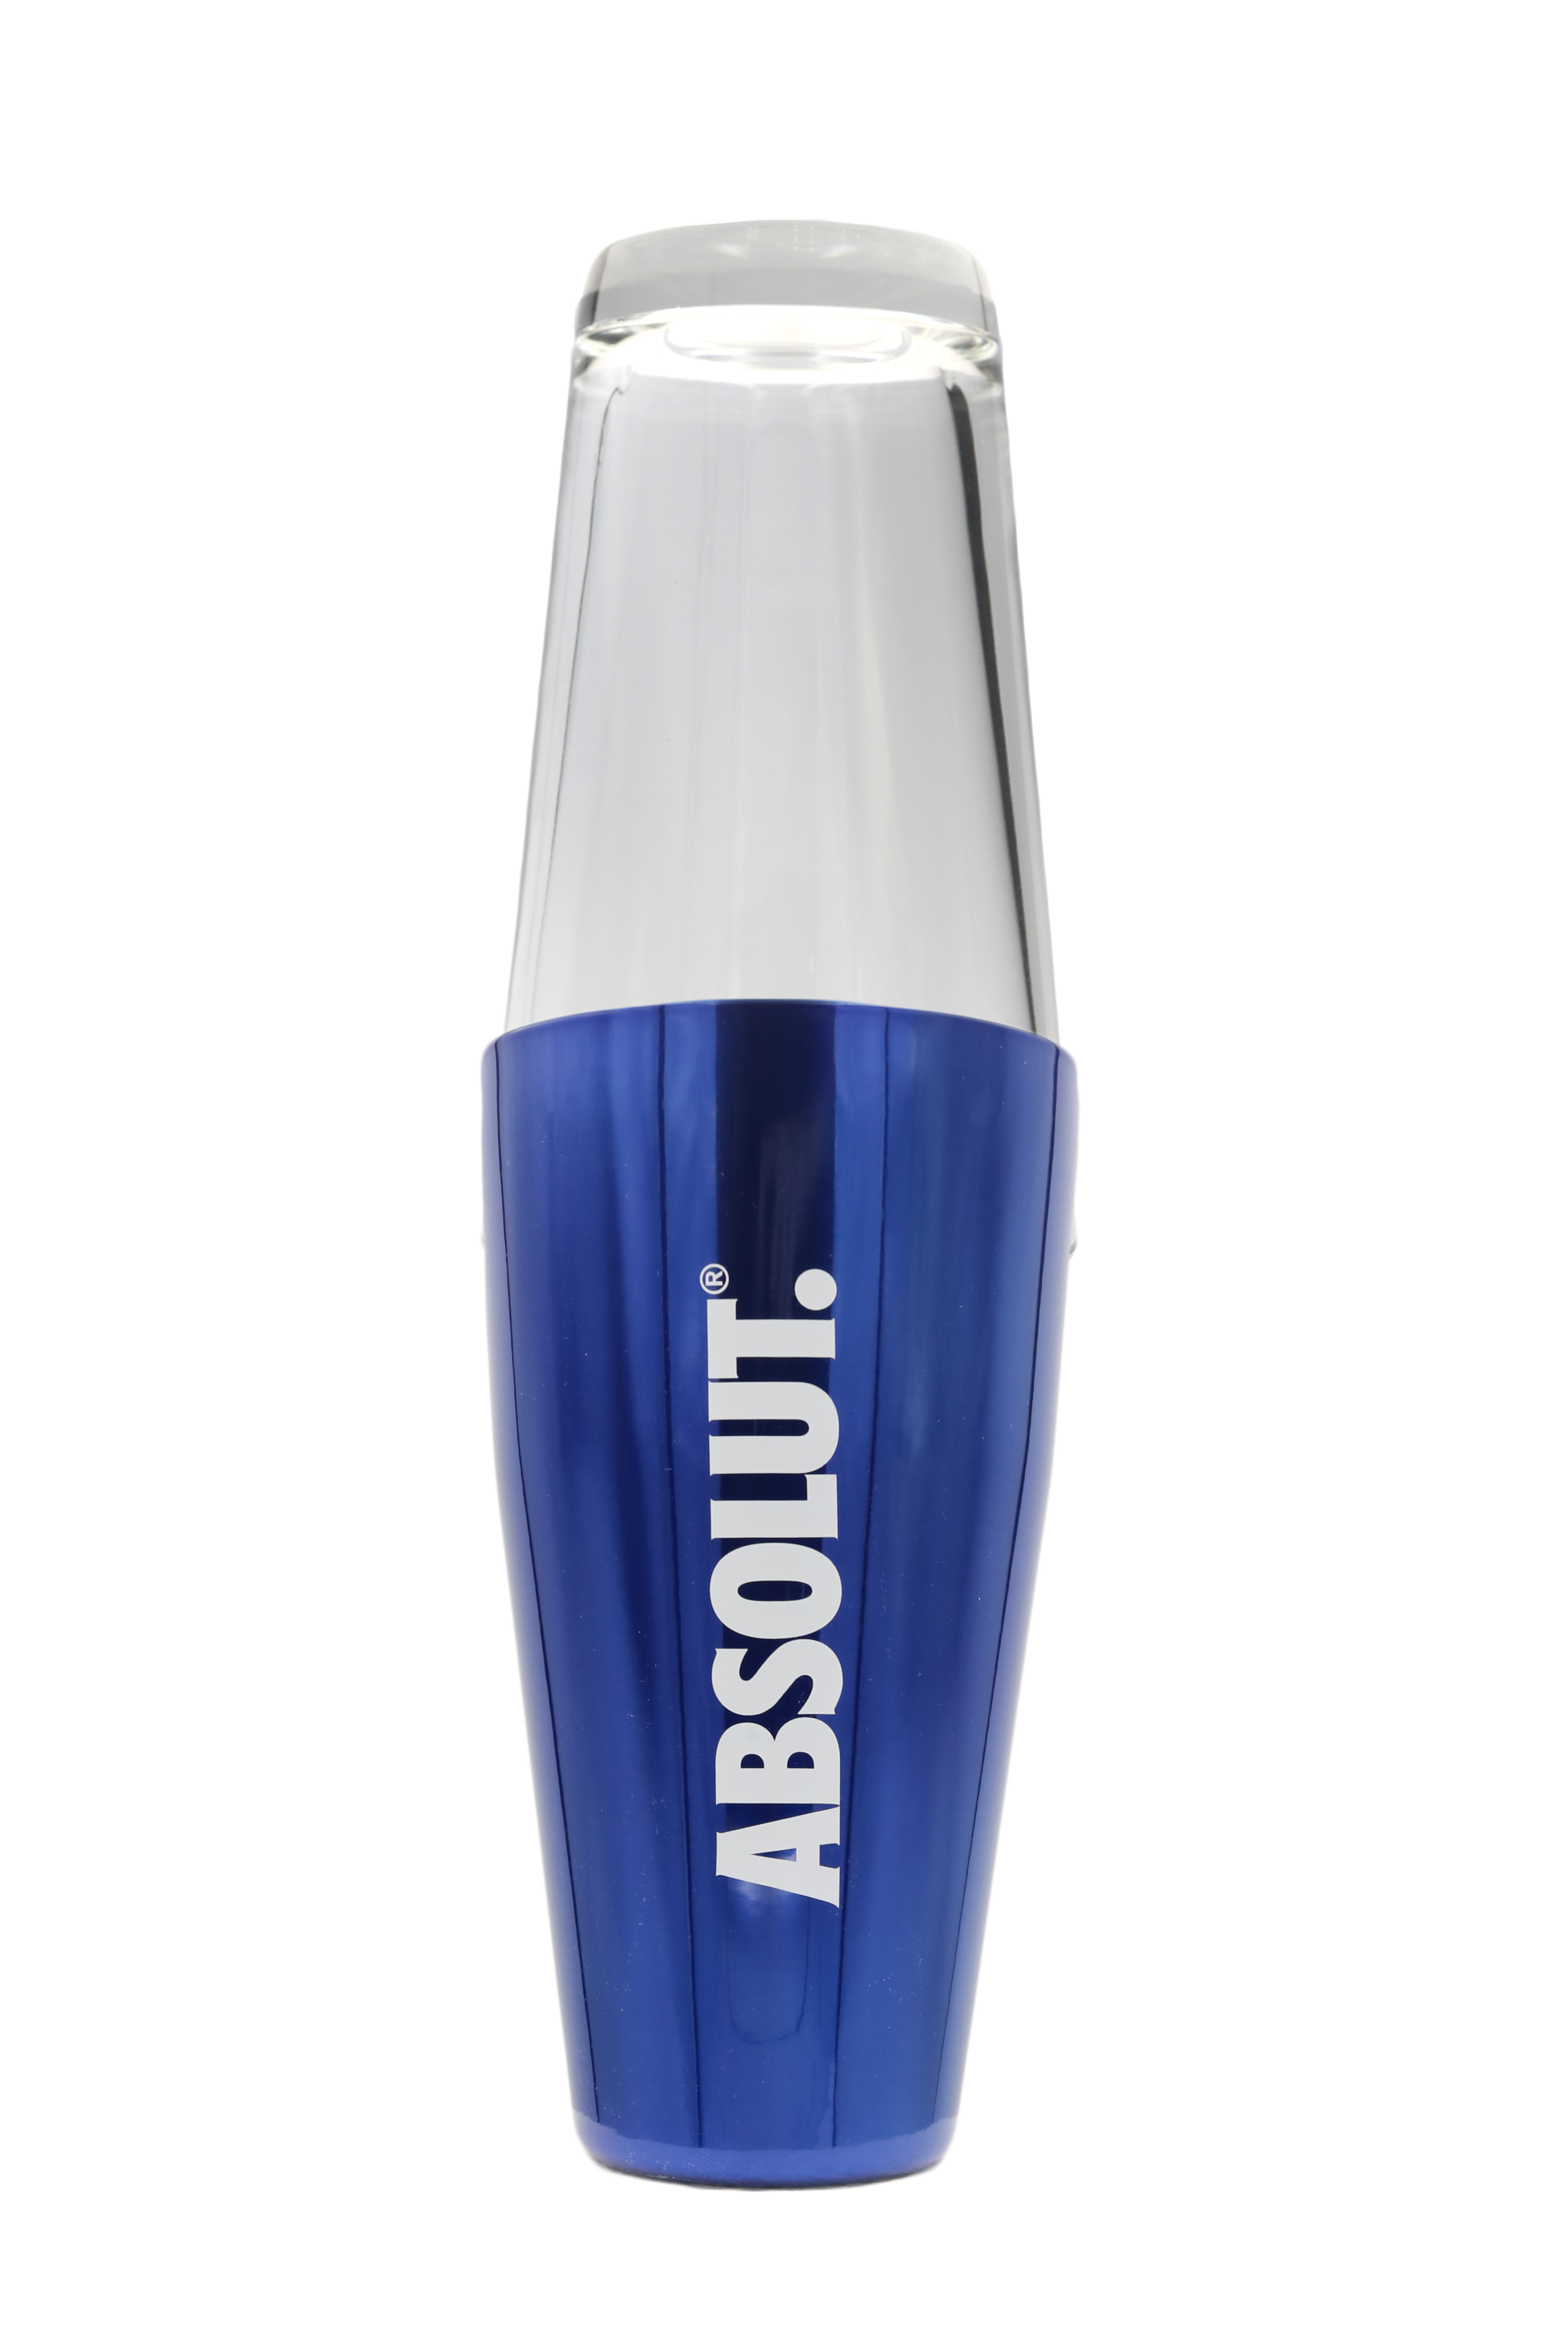 Boston Shaker Absolut Blu